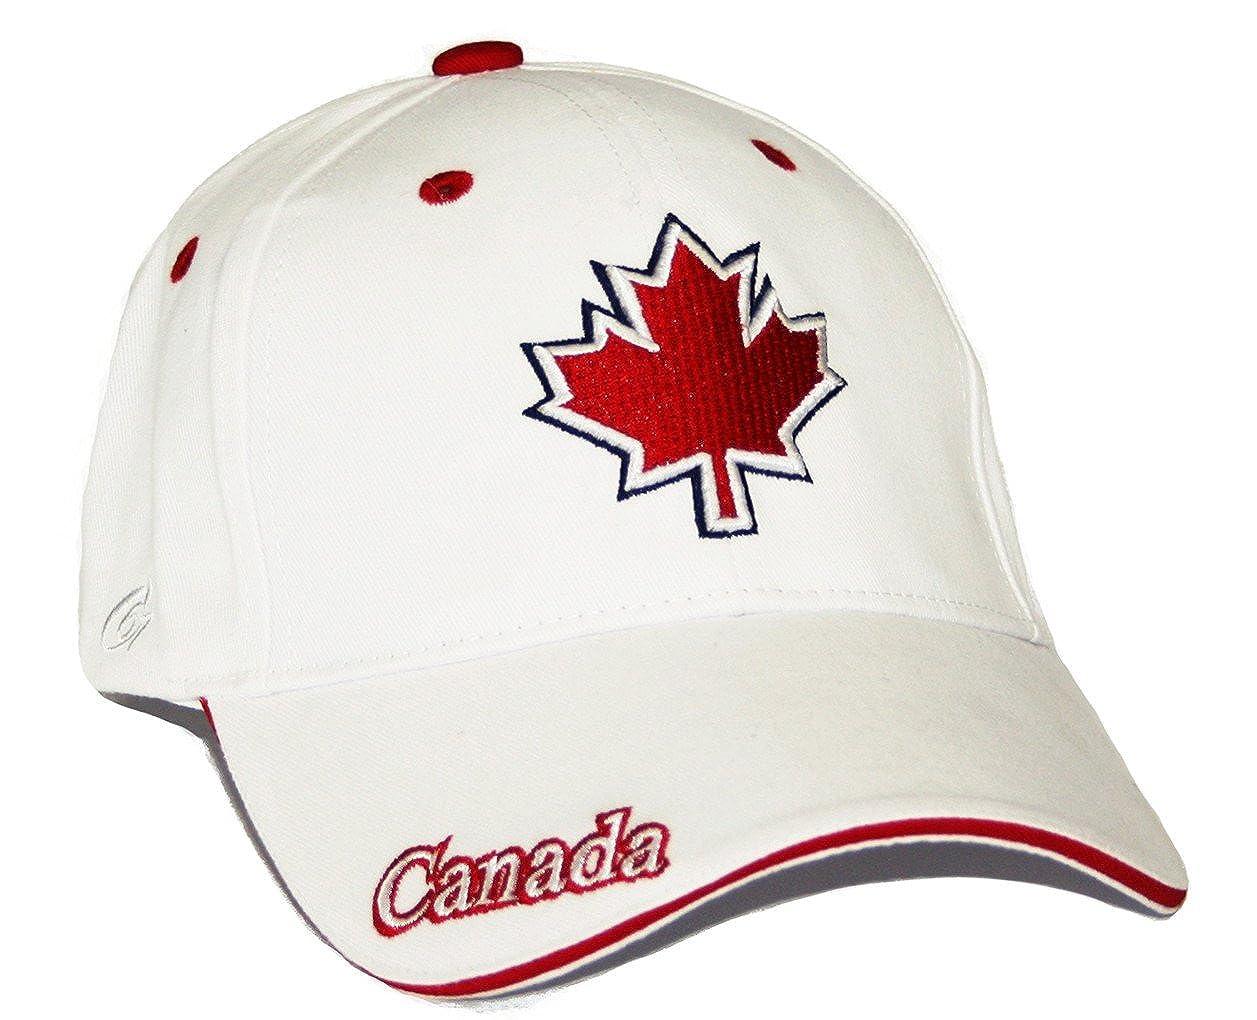 Canada Baseball Cap Maple Leaf Flag Adjustable Hat True North - White   Amazon.ca  Clothing   Accessories dbdd77e9330